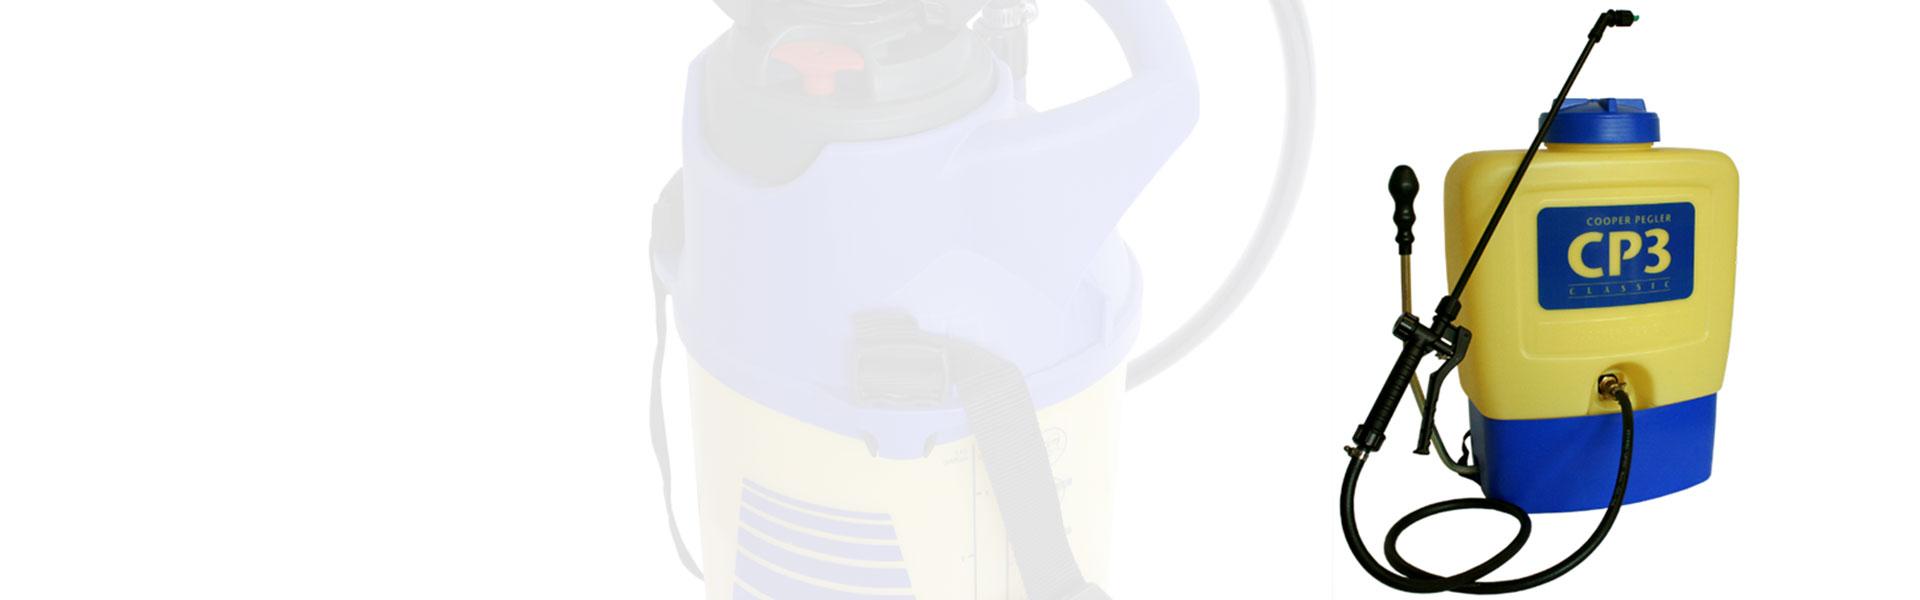 Home   Spindrift Sprayers in United Kingdom